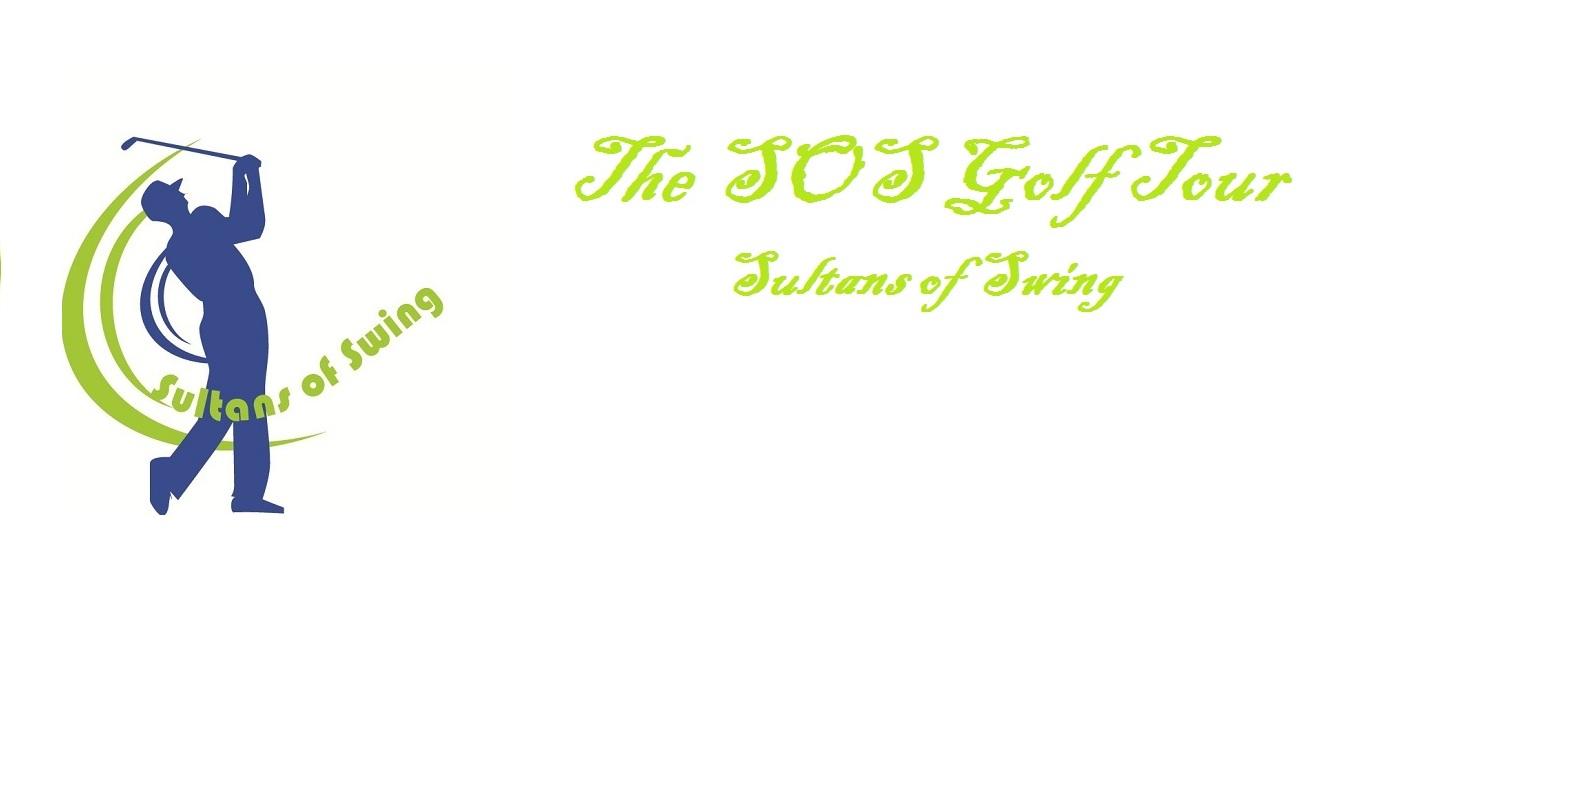 SOS Golf Tour Logo